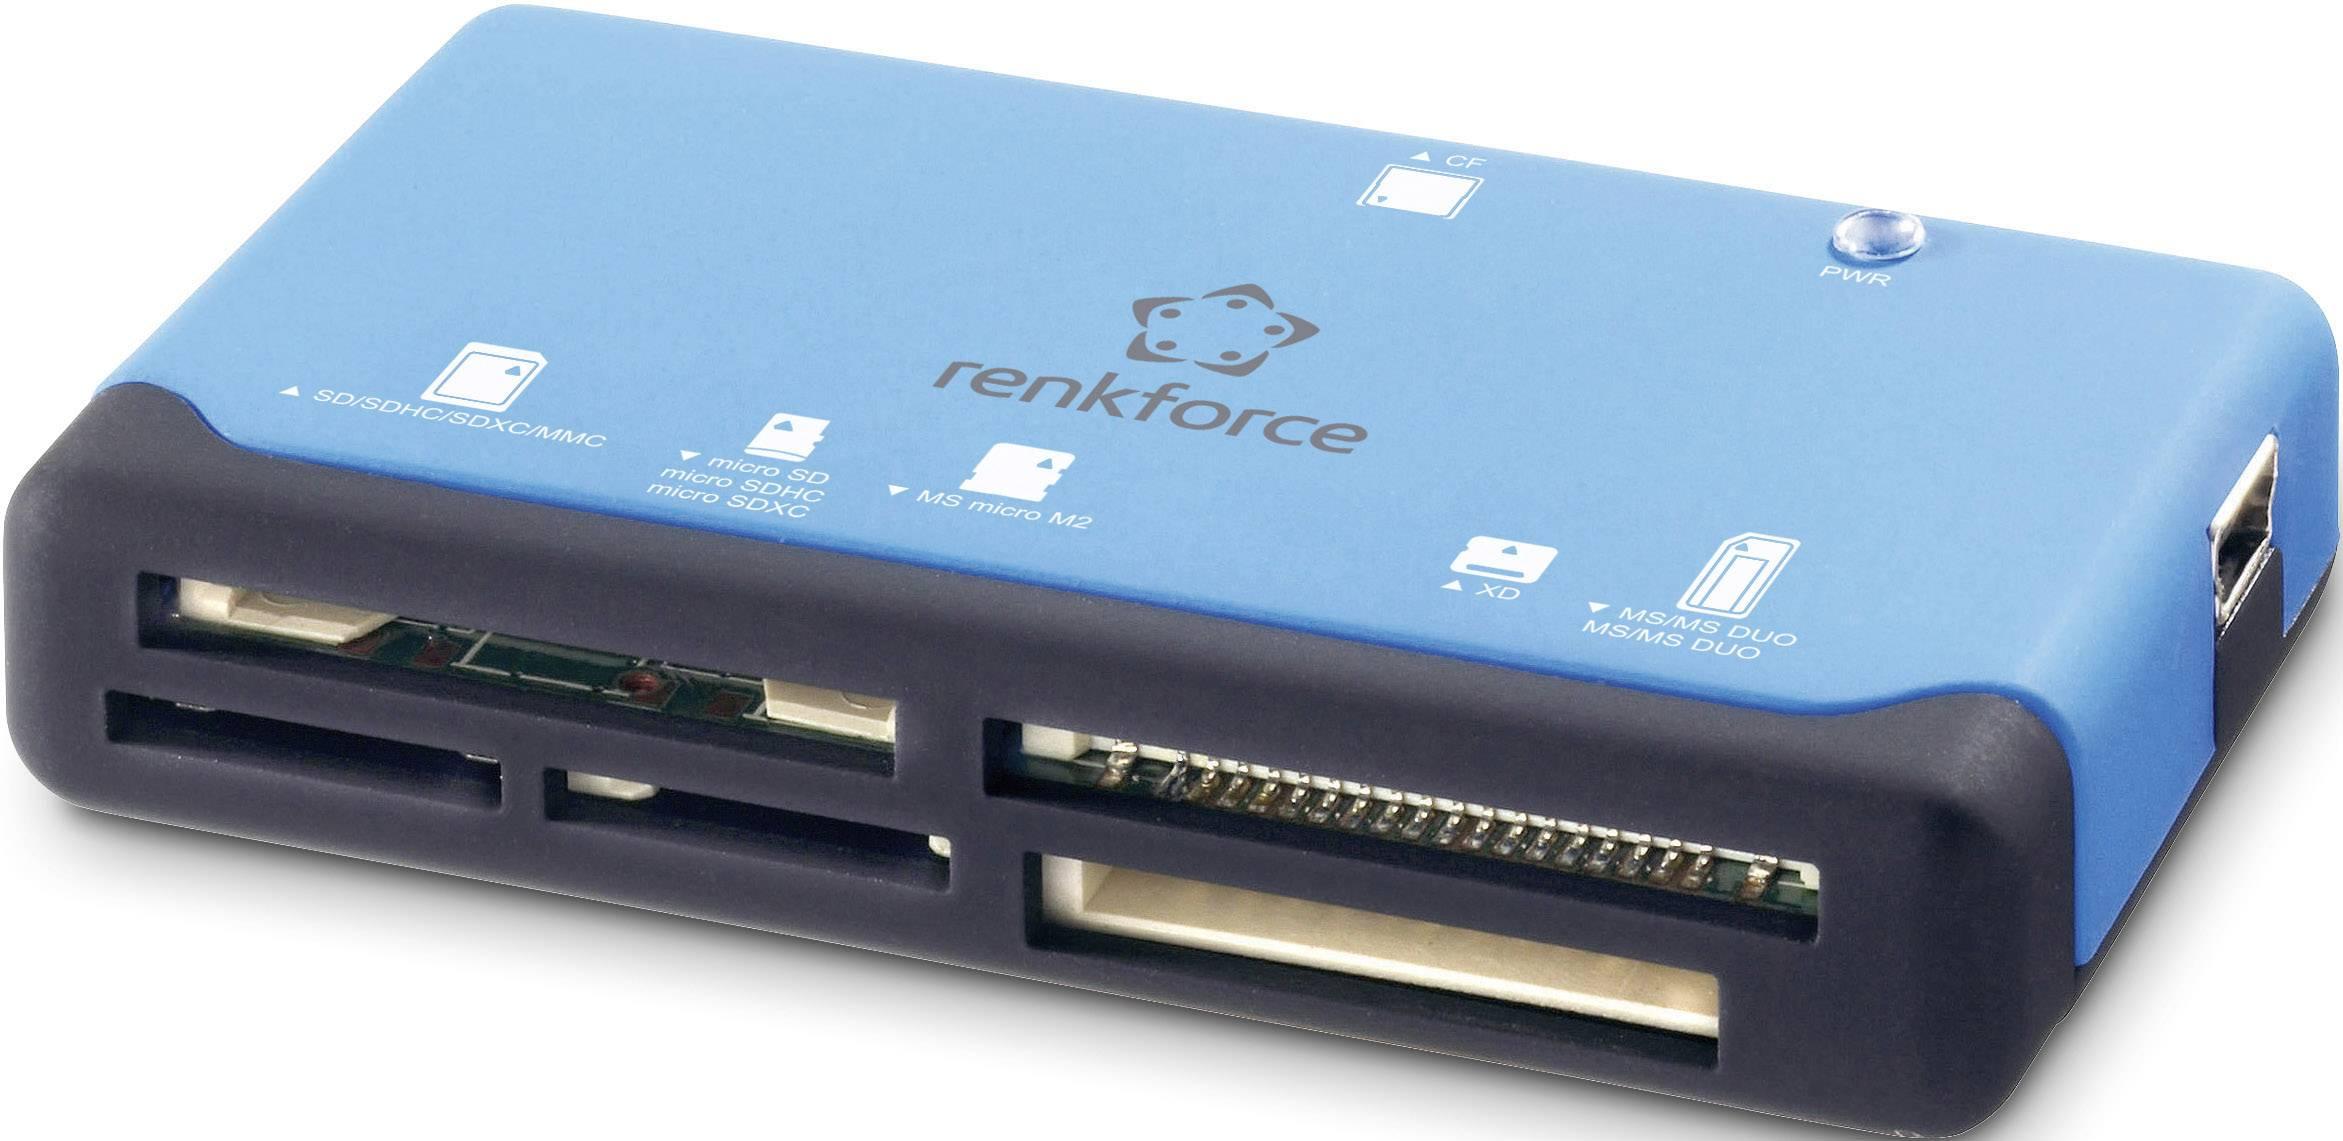 Externá čítačka pamäťových kariet Renkforce CR17e, USB 2.0, modrá